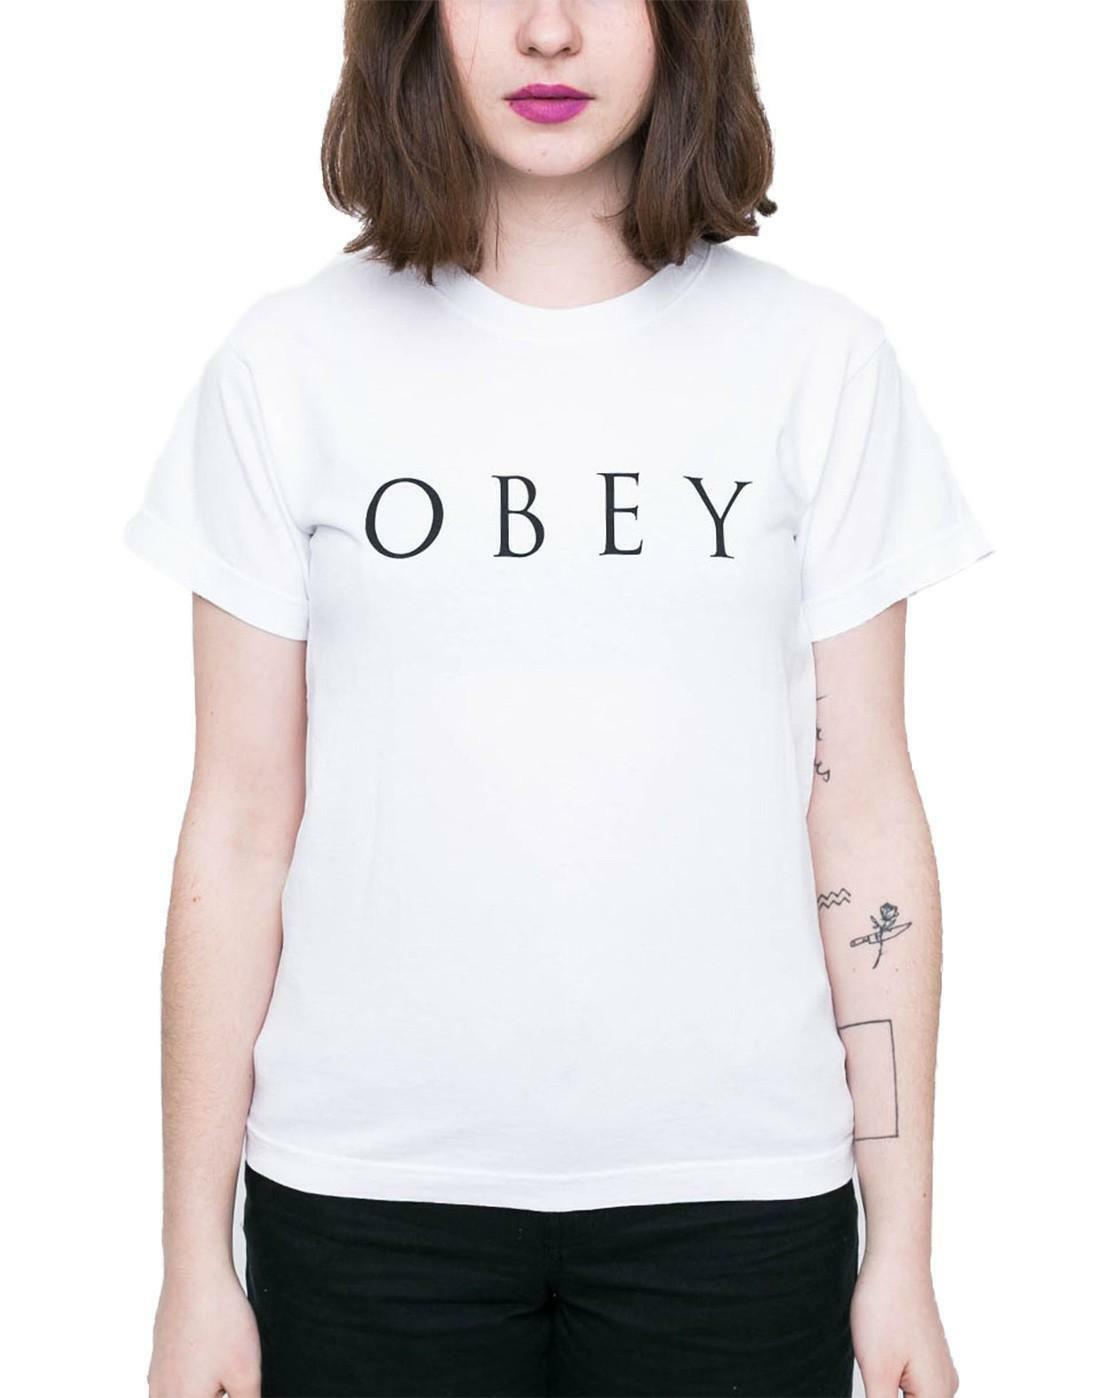 obey obey novel t-shirt donna bianca 266851274wht